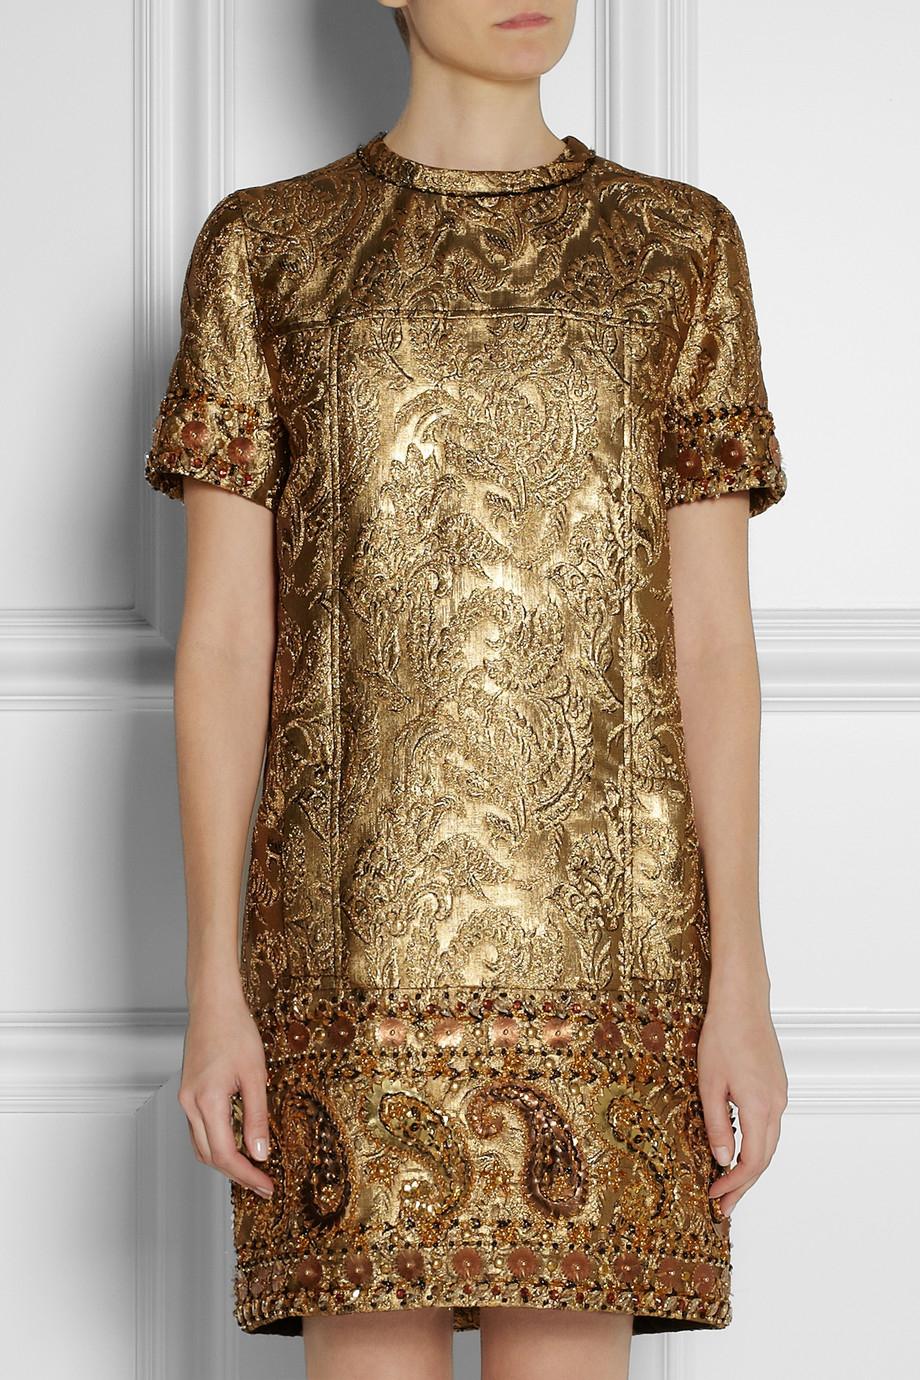 Lyst Lanvin Embellished Metallic Brocade Dress In Metallic